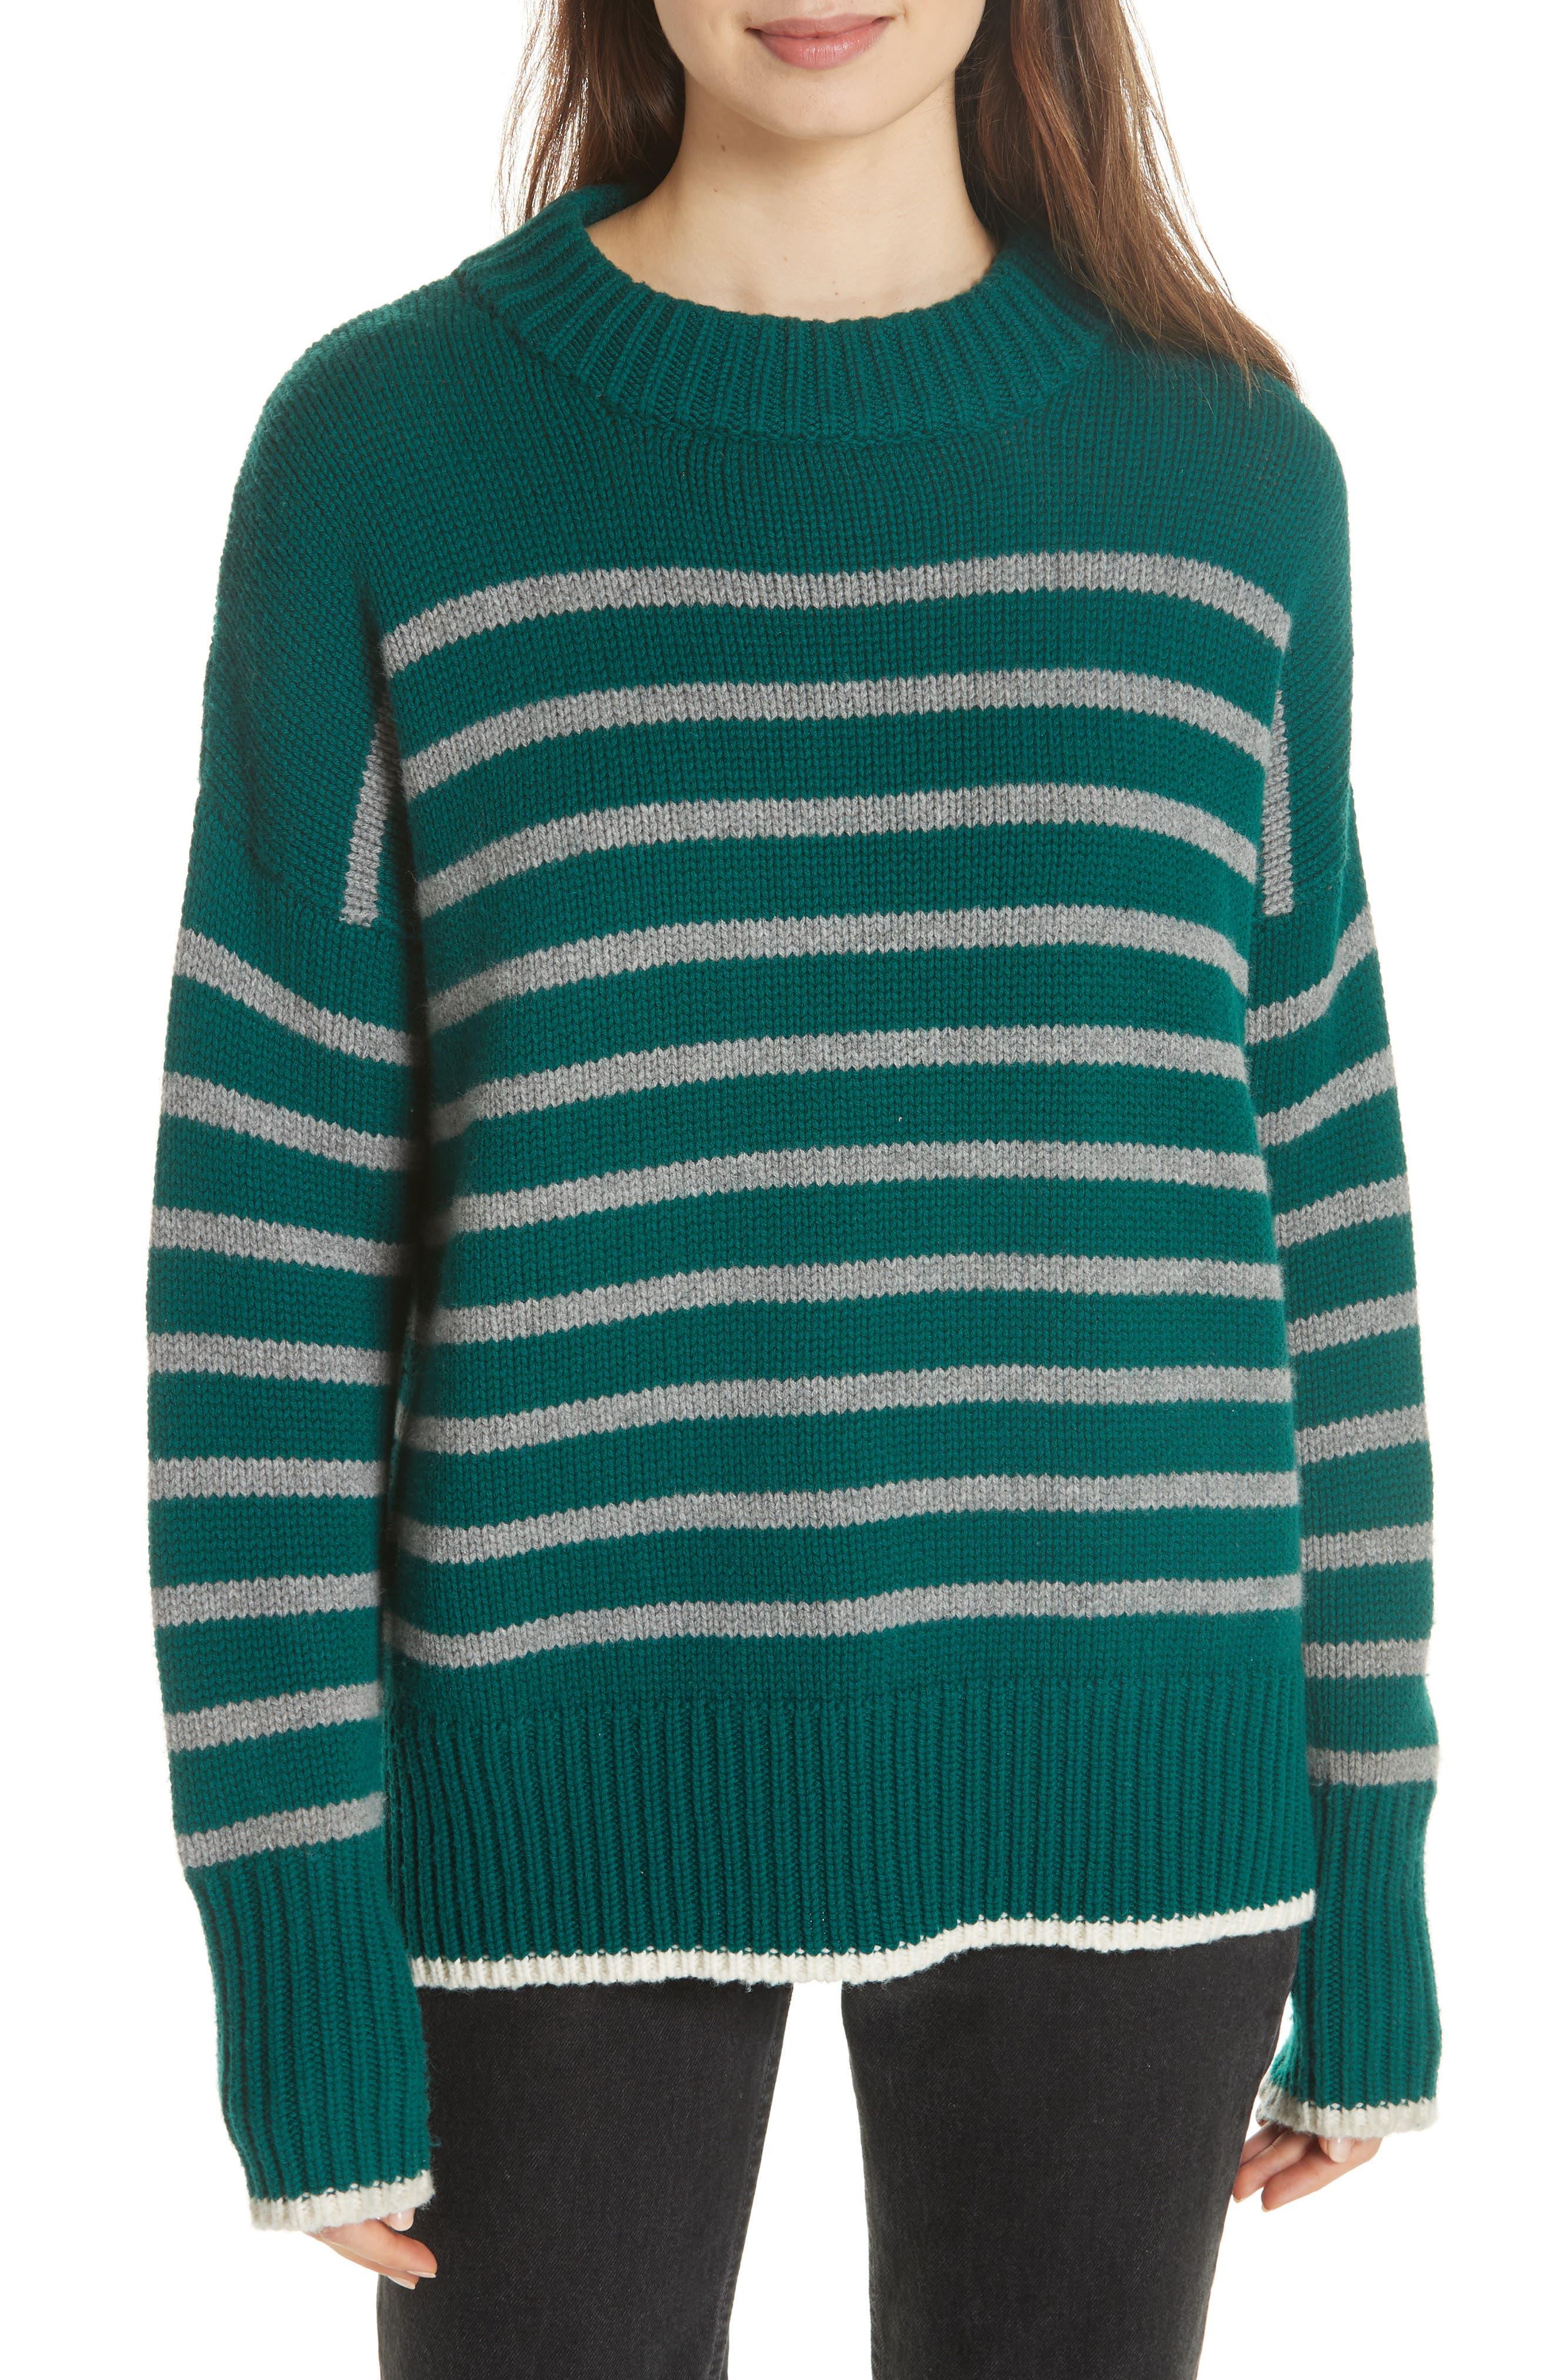 La Ligne Marin Wool & Cashmere Sweater, Green